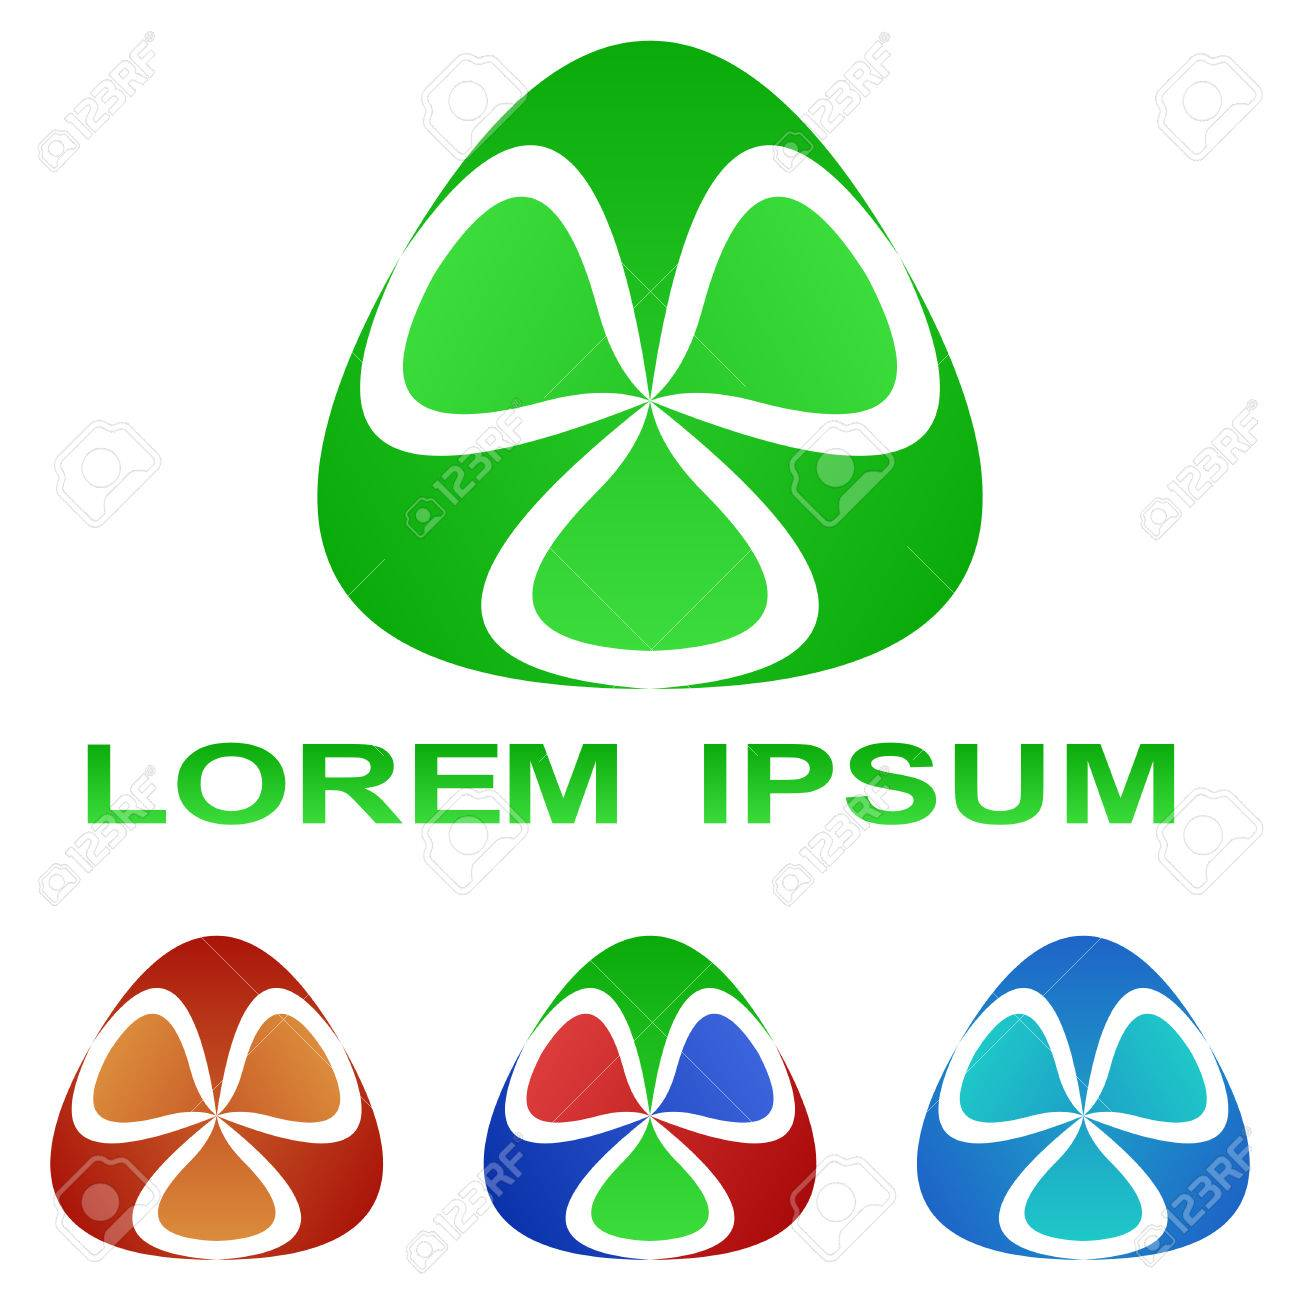 Green Bio Technology Company Symbol Design Set Royalty Free Cliparts